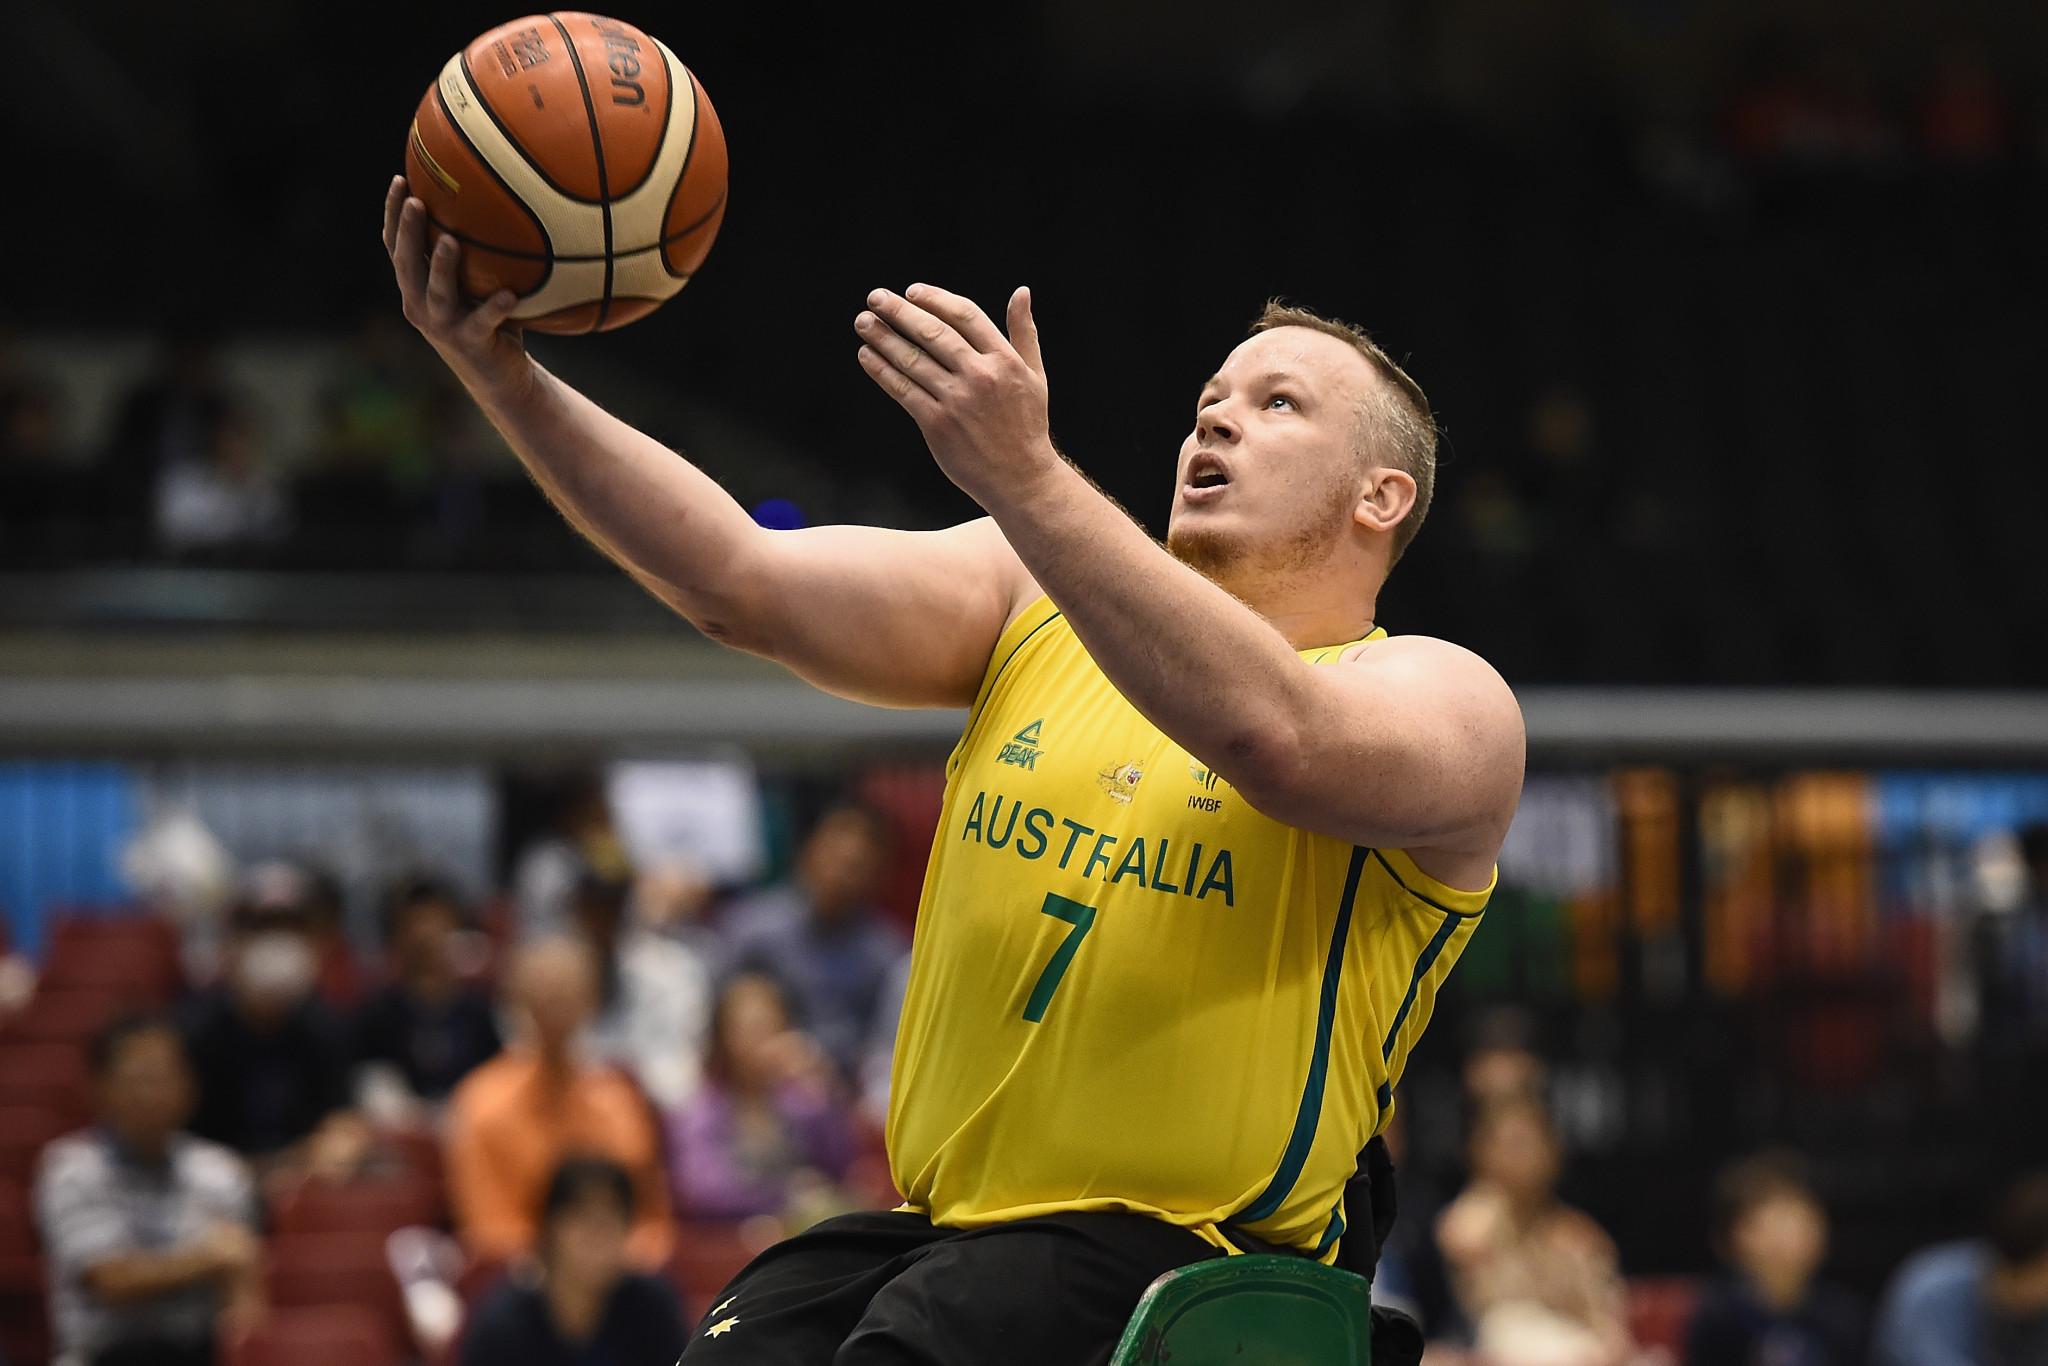 Australian men's wheelchair basketball team eye Tokyo 2020 gold after naming squad